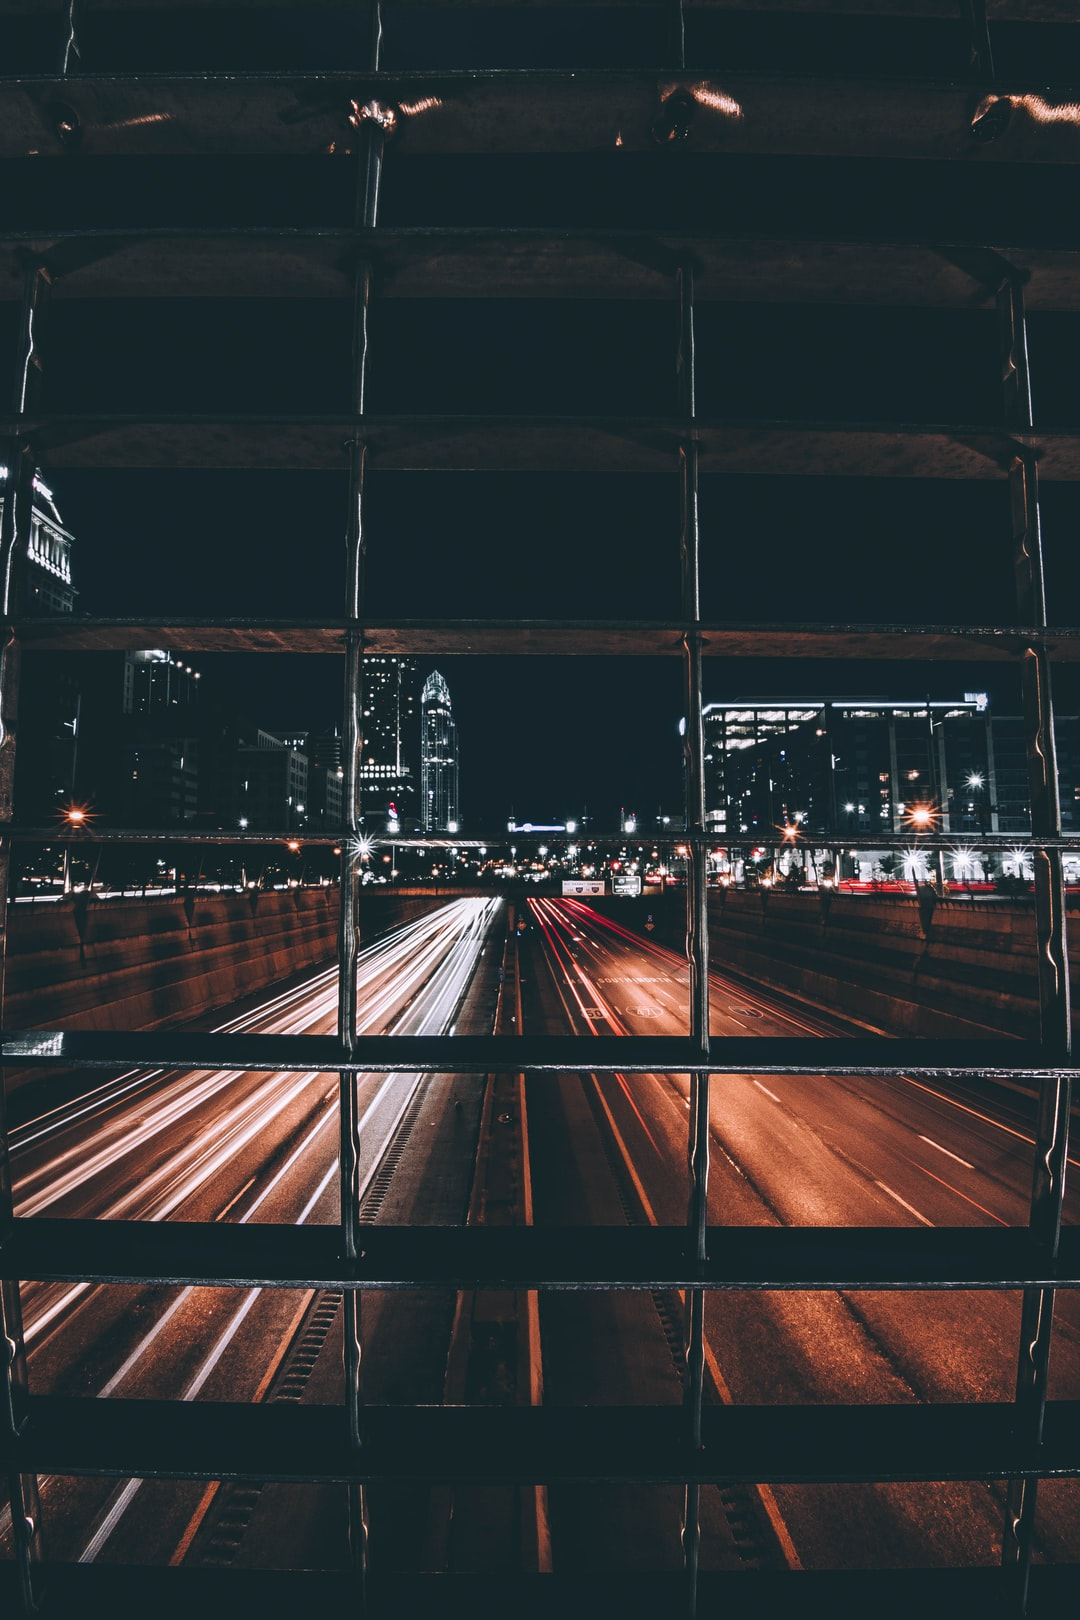 Traffic at night in Cincinnati